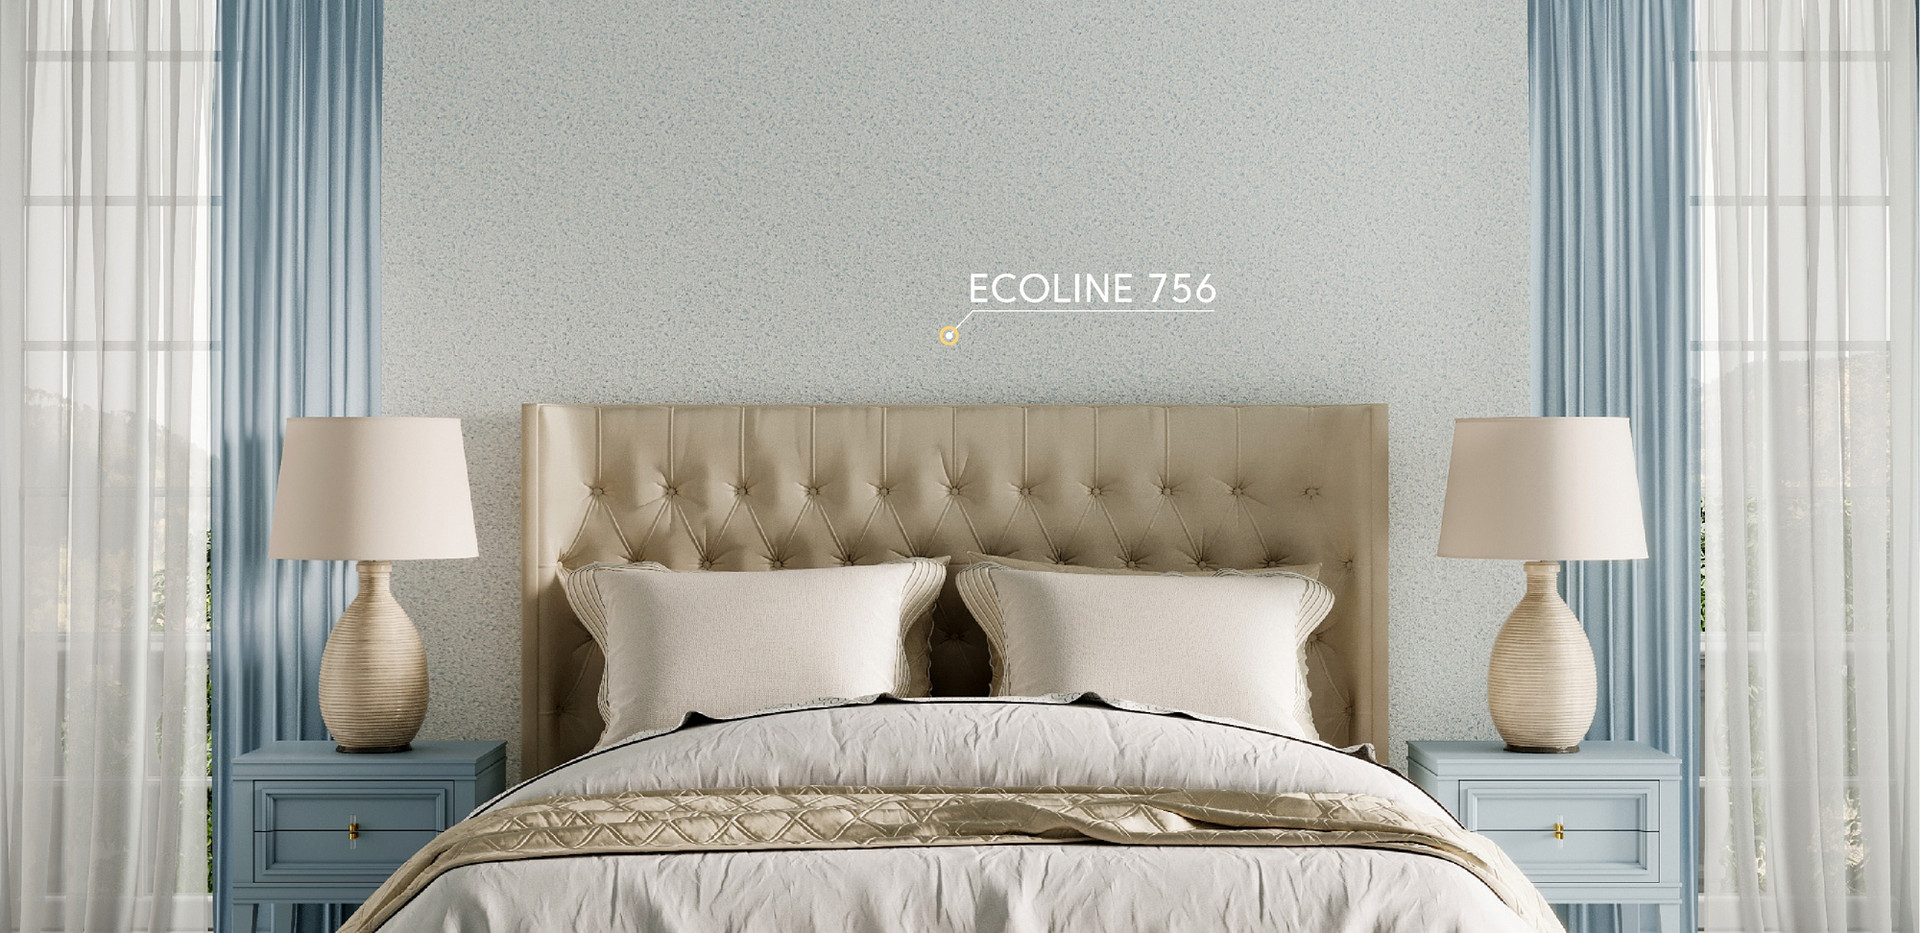 Ecoline 756.jpg